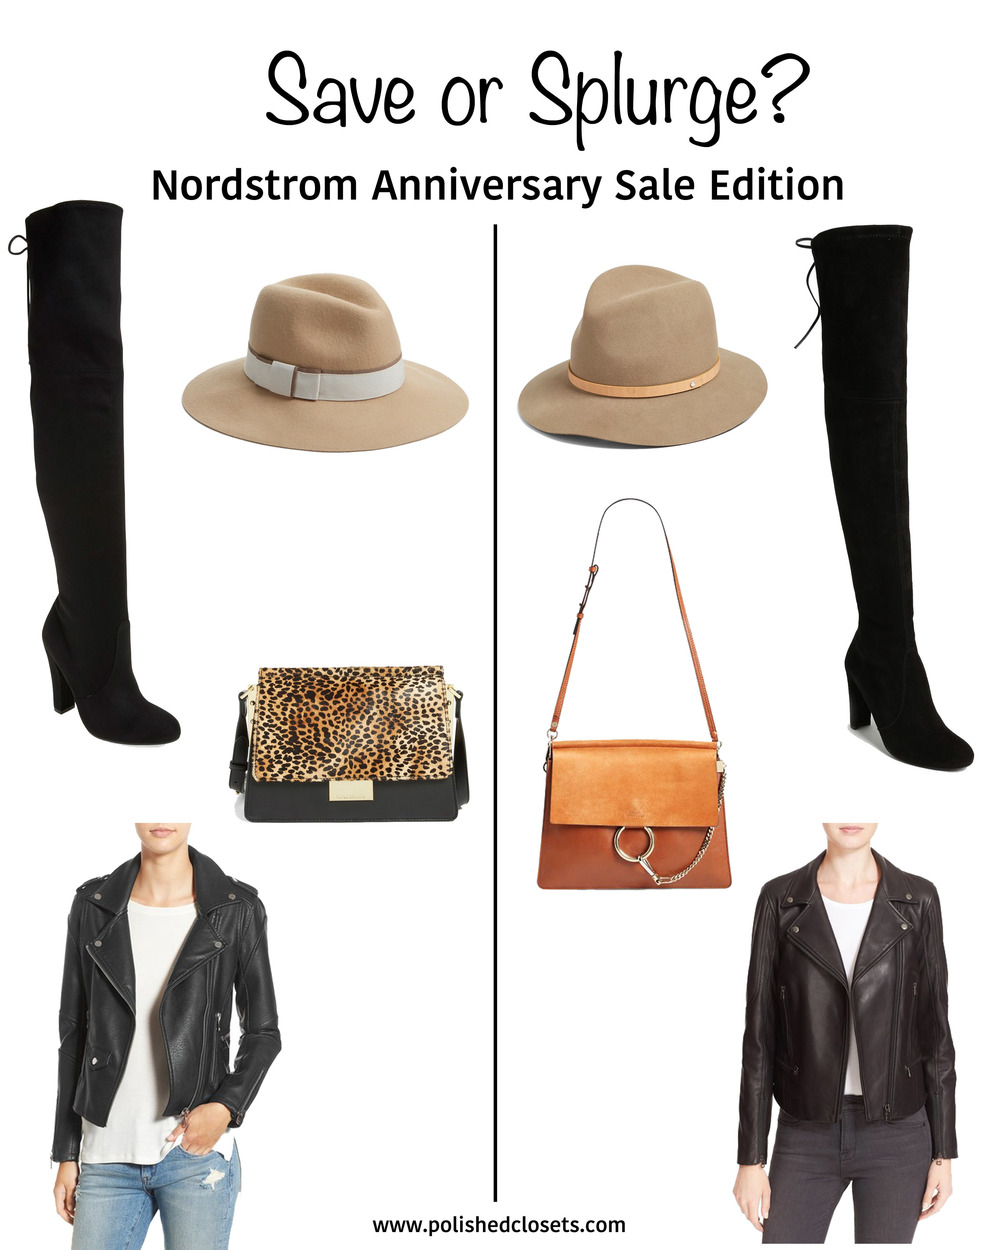 Save or Splurge? Nordstrom Anniversary Sale Edition || www.polishedclosets.com